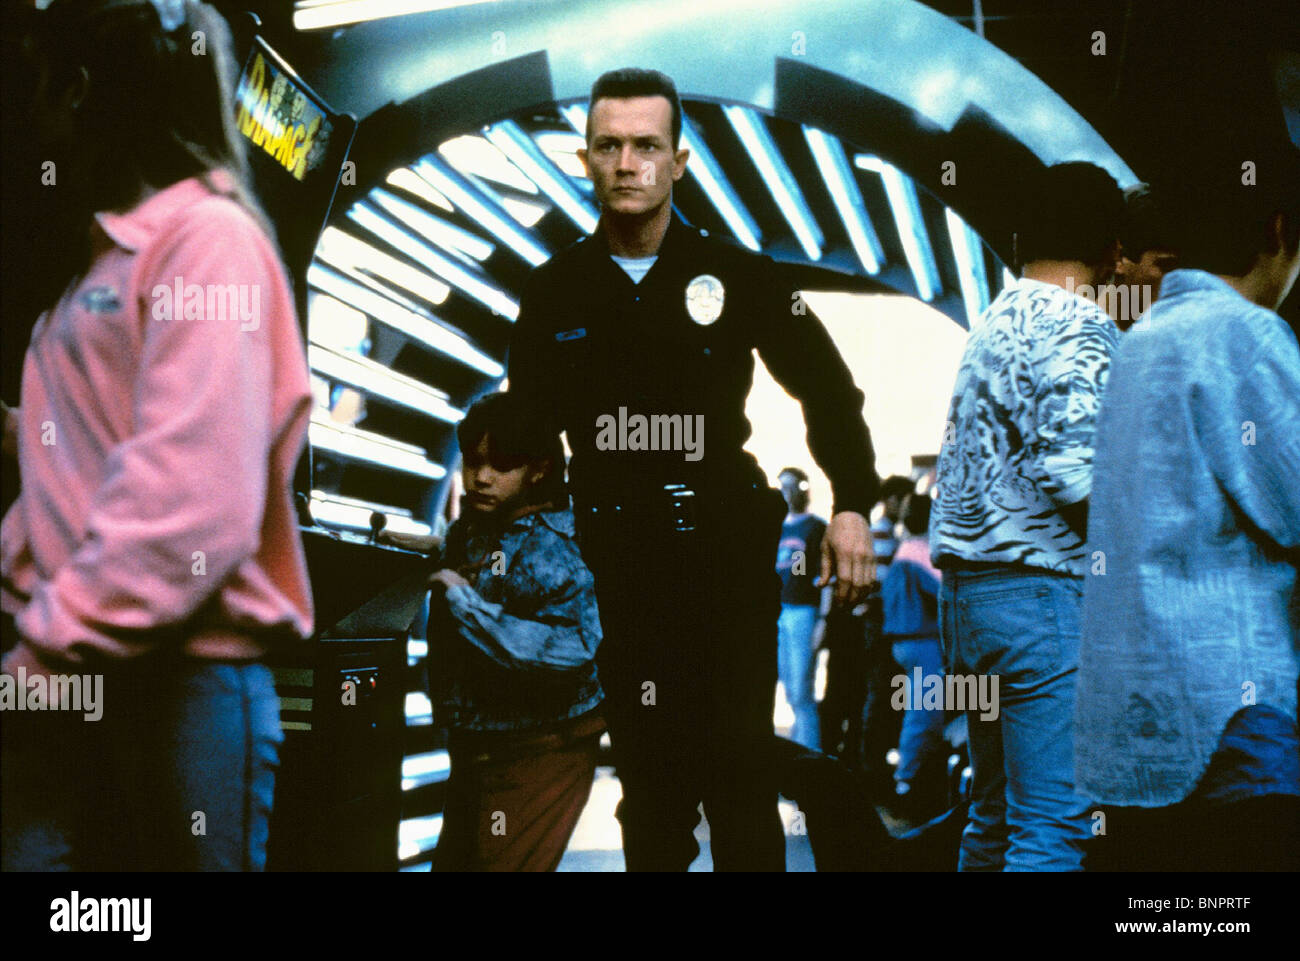 ROBERT PATRICK TERMINATOR 2: JUDGMENT DAY (1991) - Stock Image